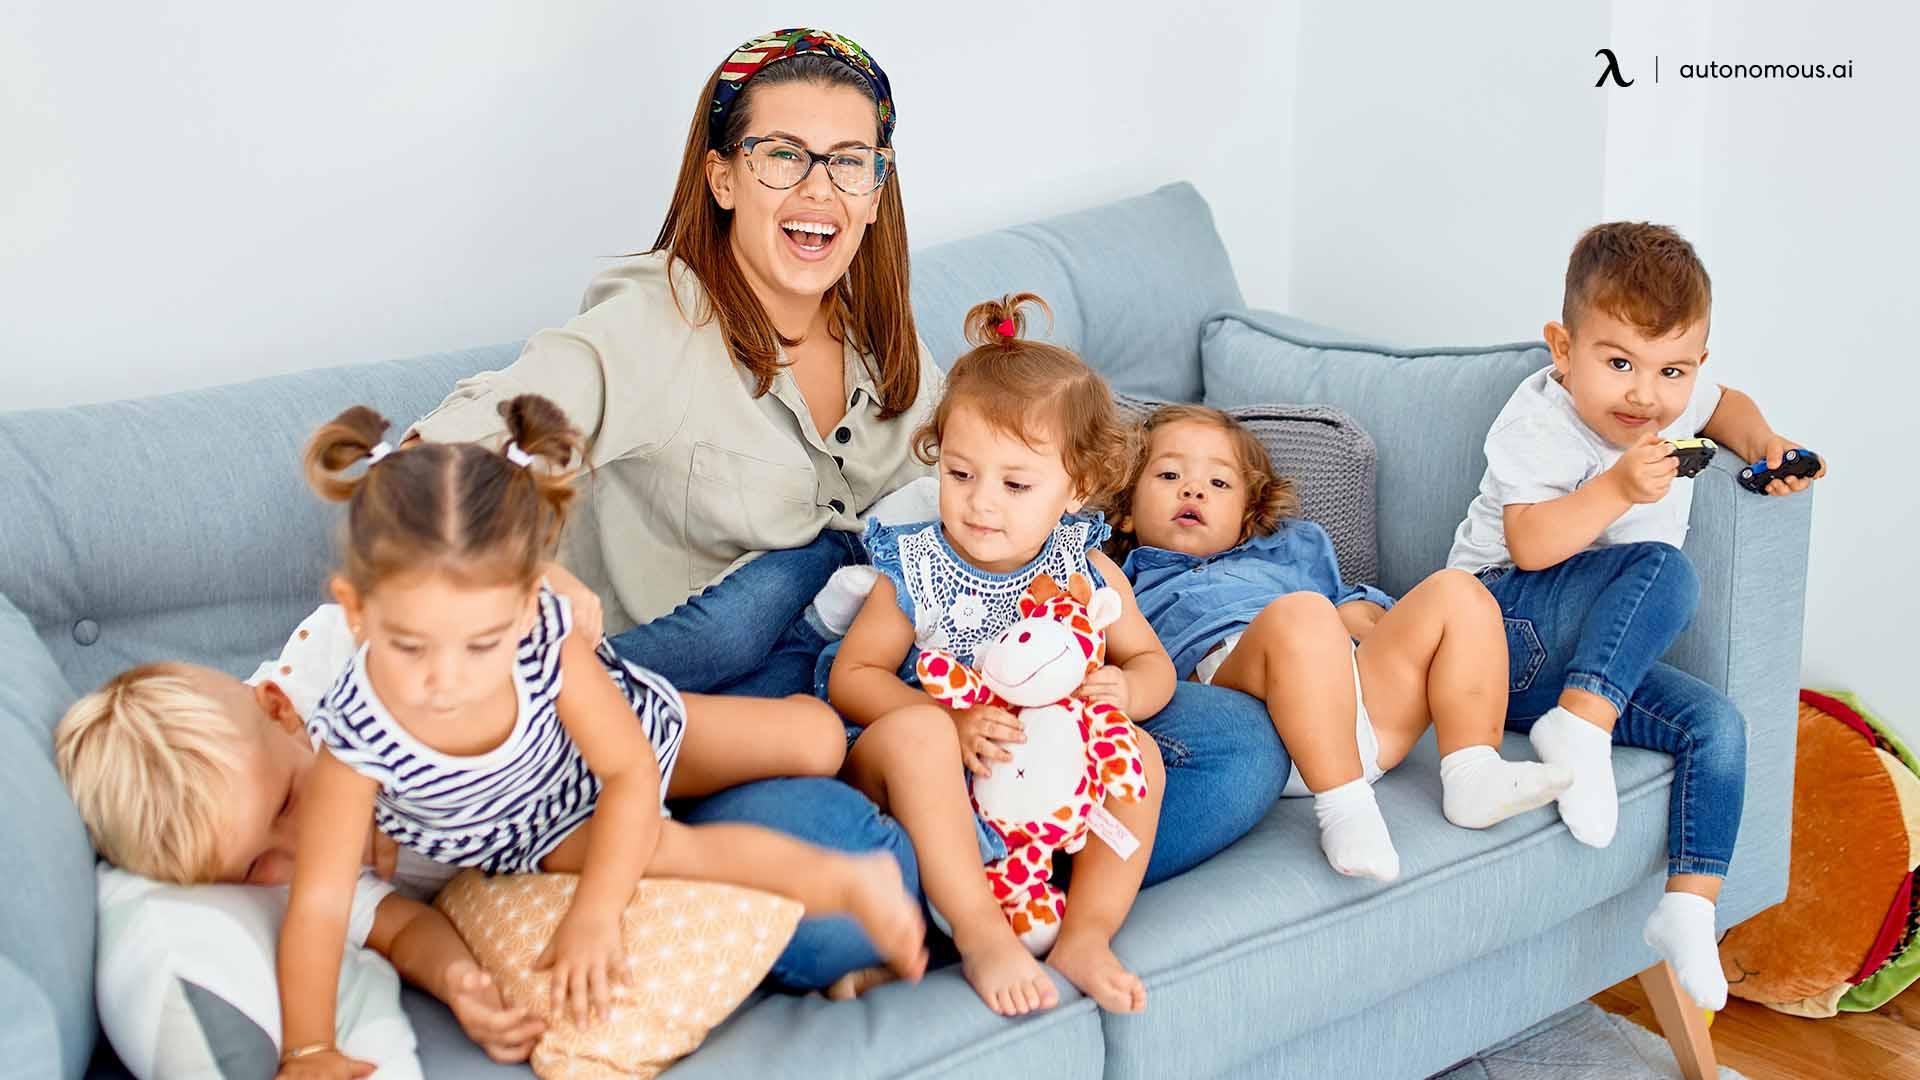 Extra Child Care Benefits